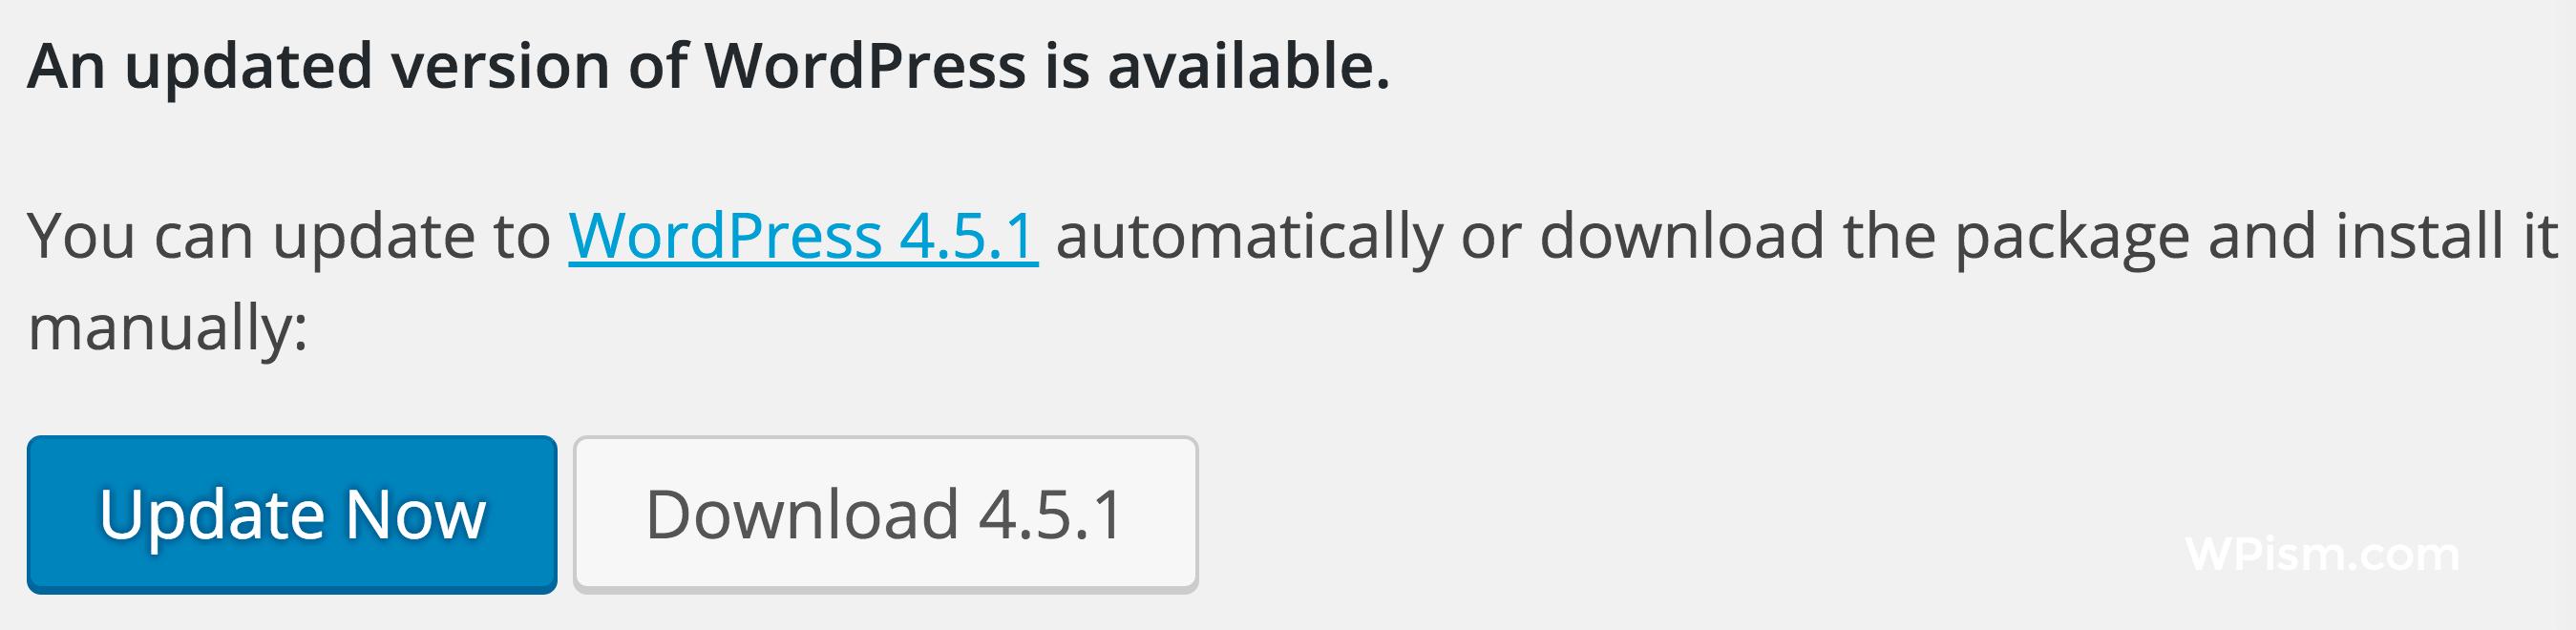 WordPress 4.5.1 Update Now Dashboard